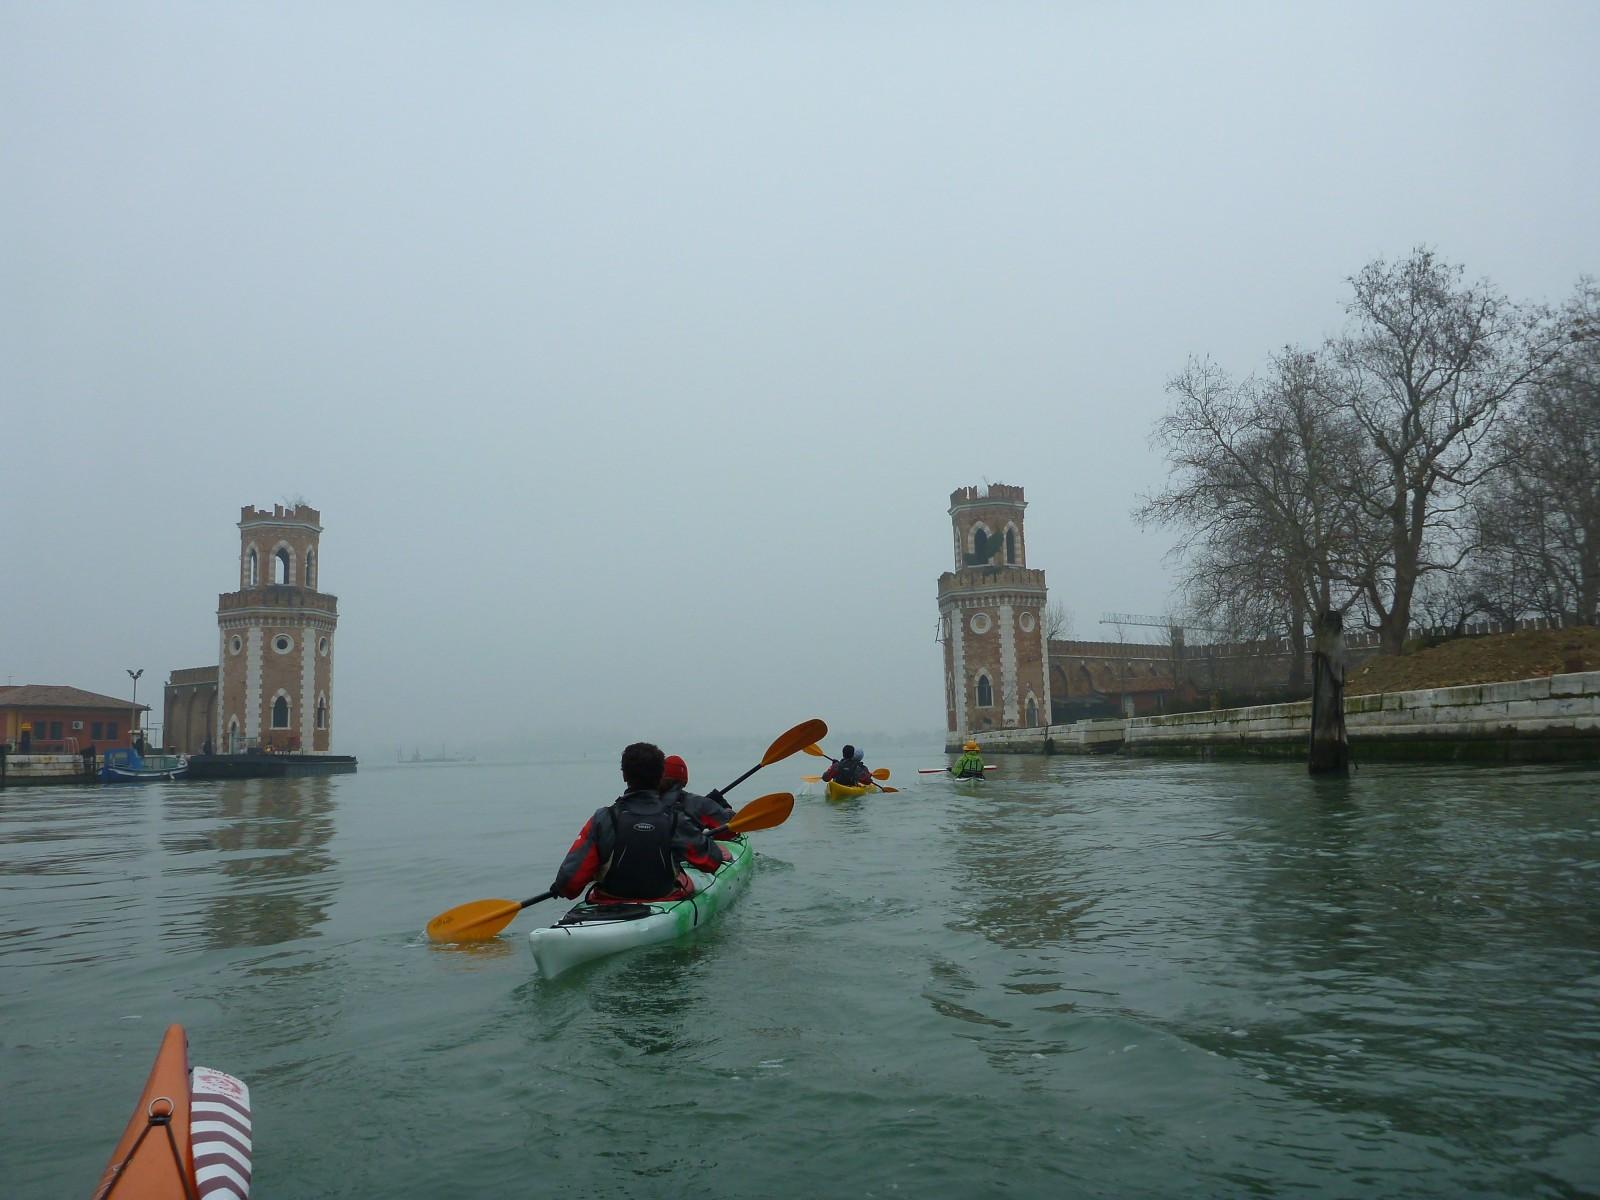 Bacino San Marco on a foggy day